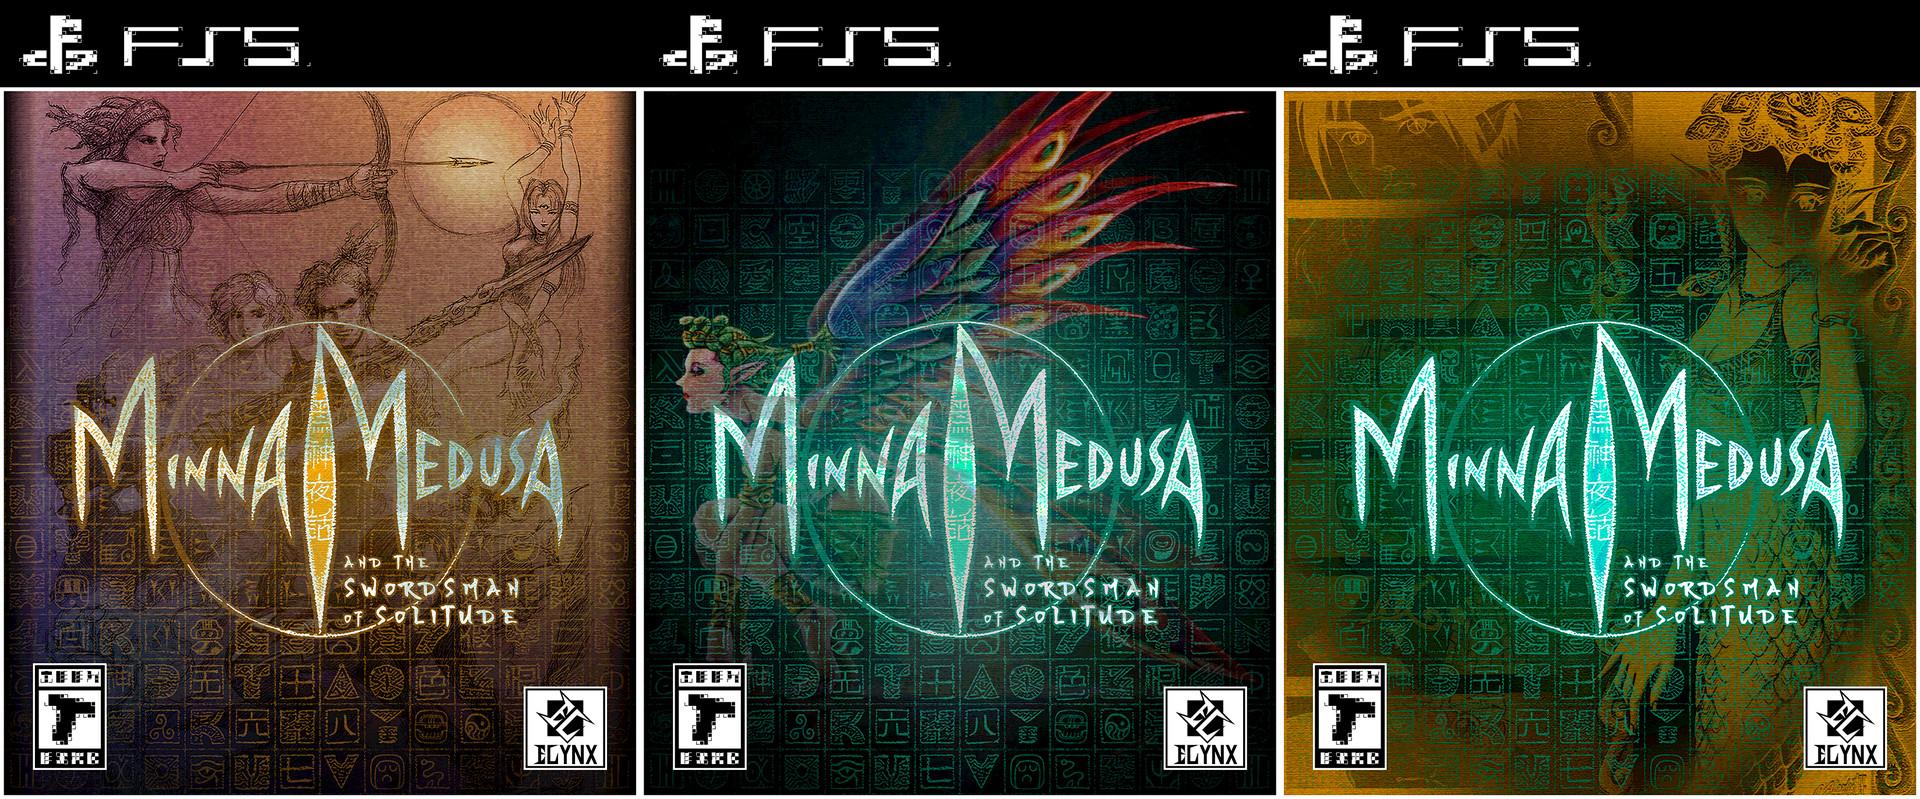 Minna Medusa - Box Art Design Triptych